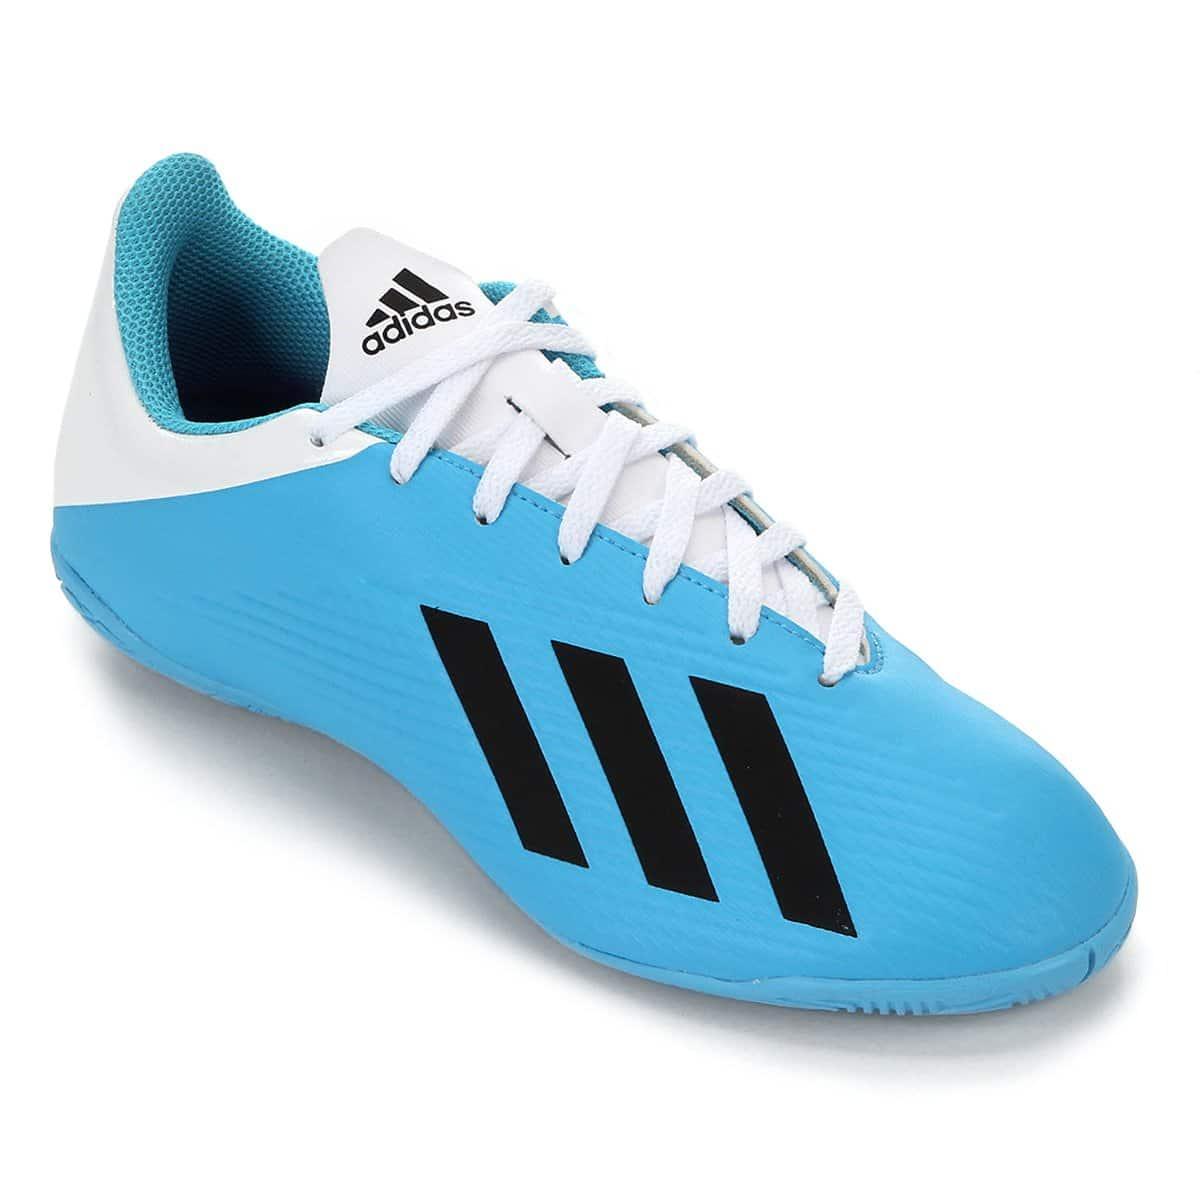 Chuteira Adidas X 19